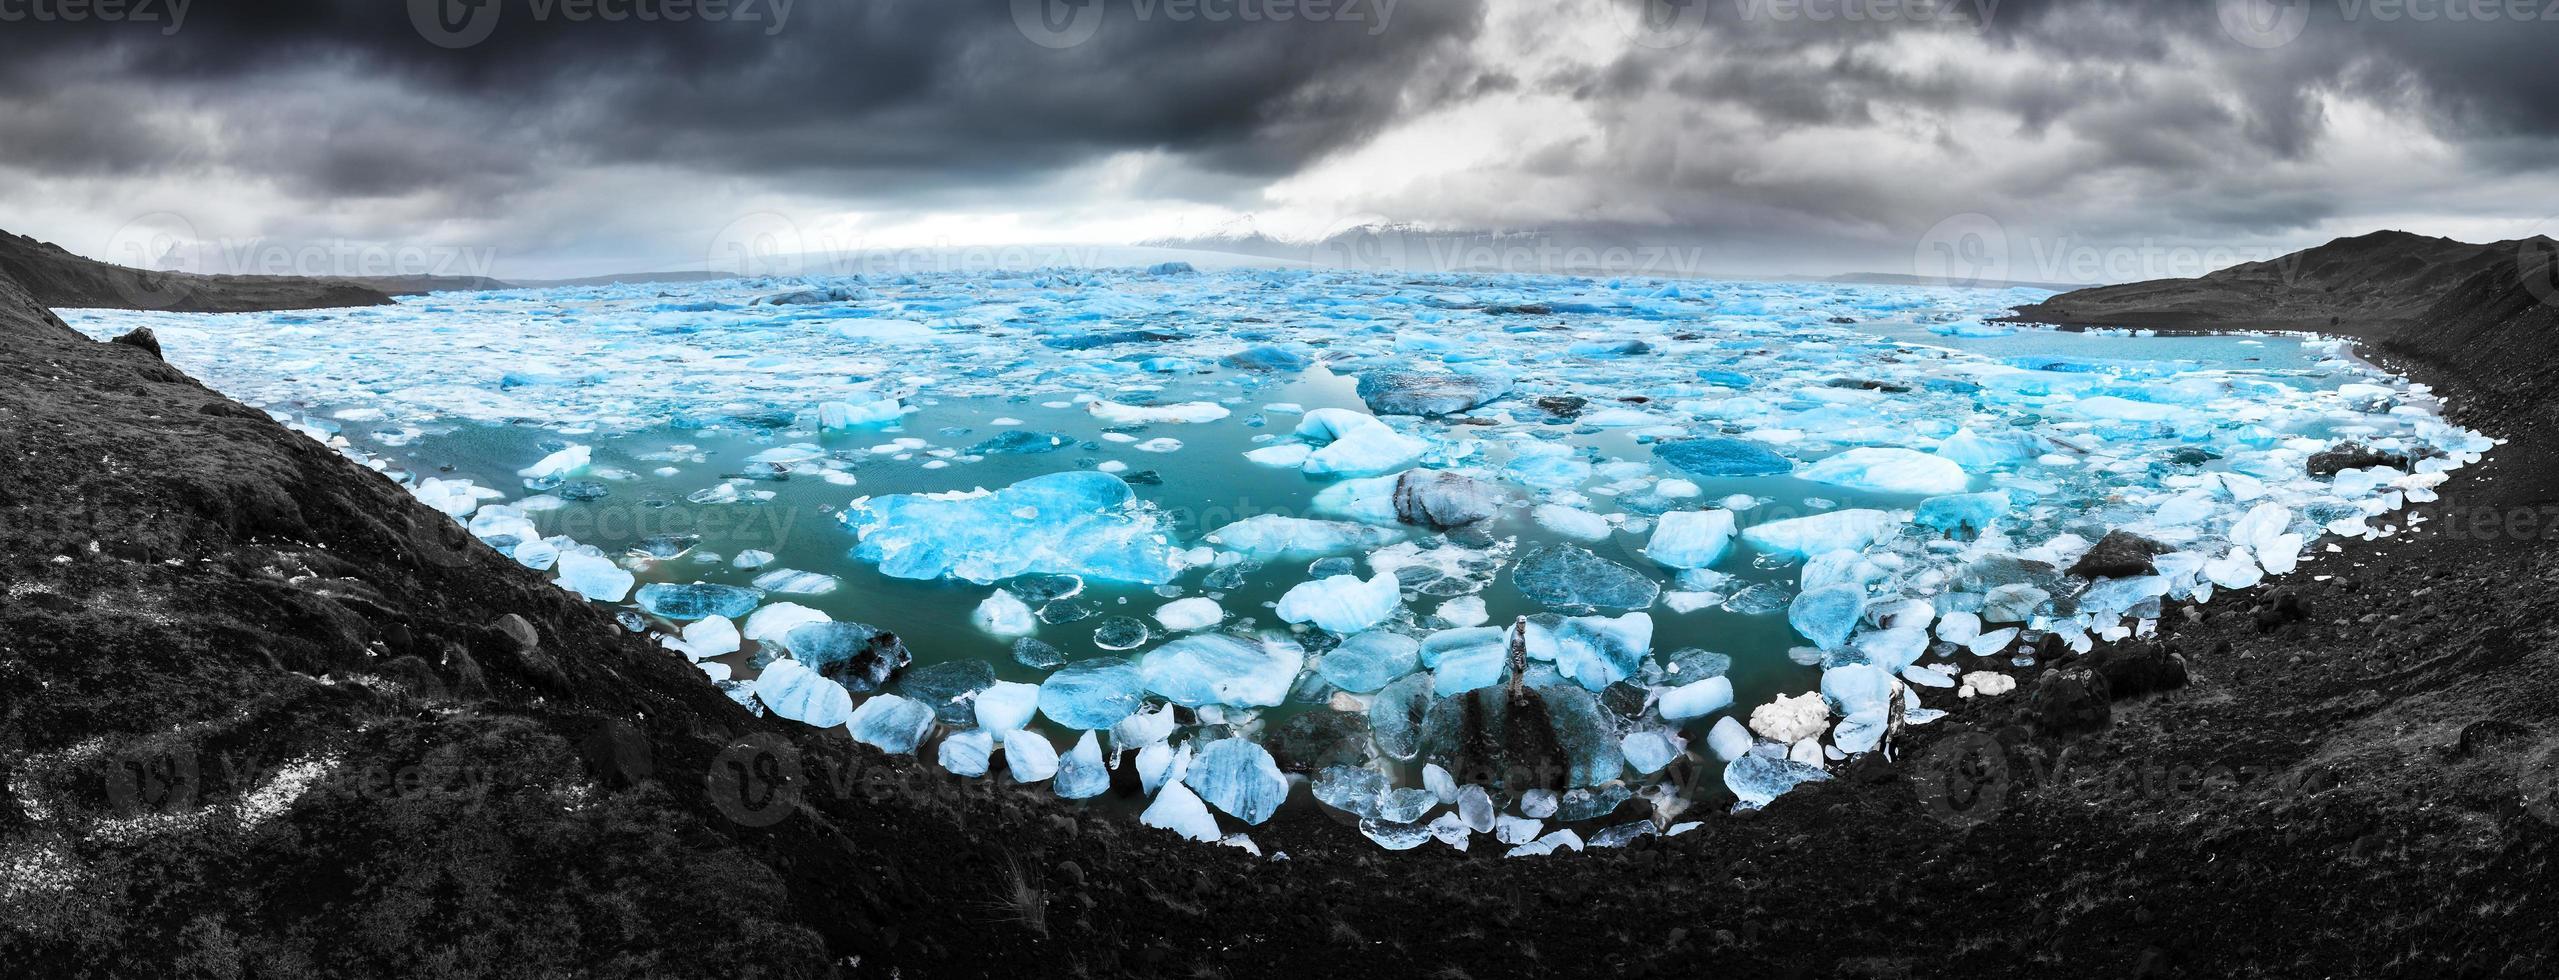 jokulsarlon blauw en zwart foto